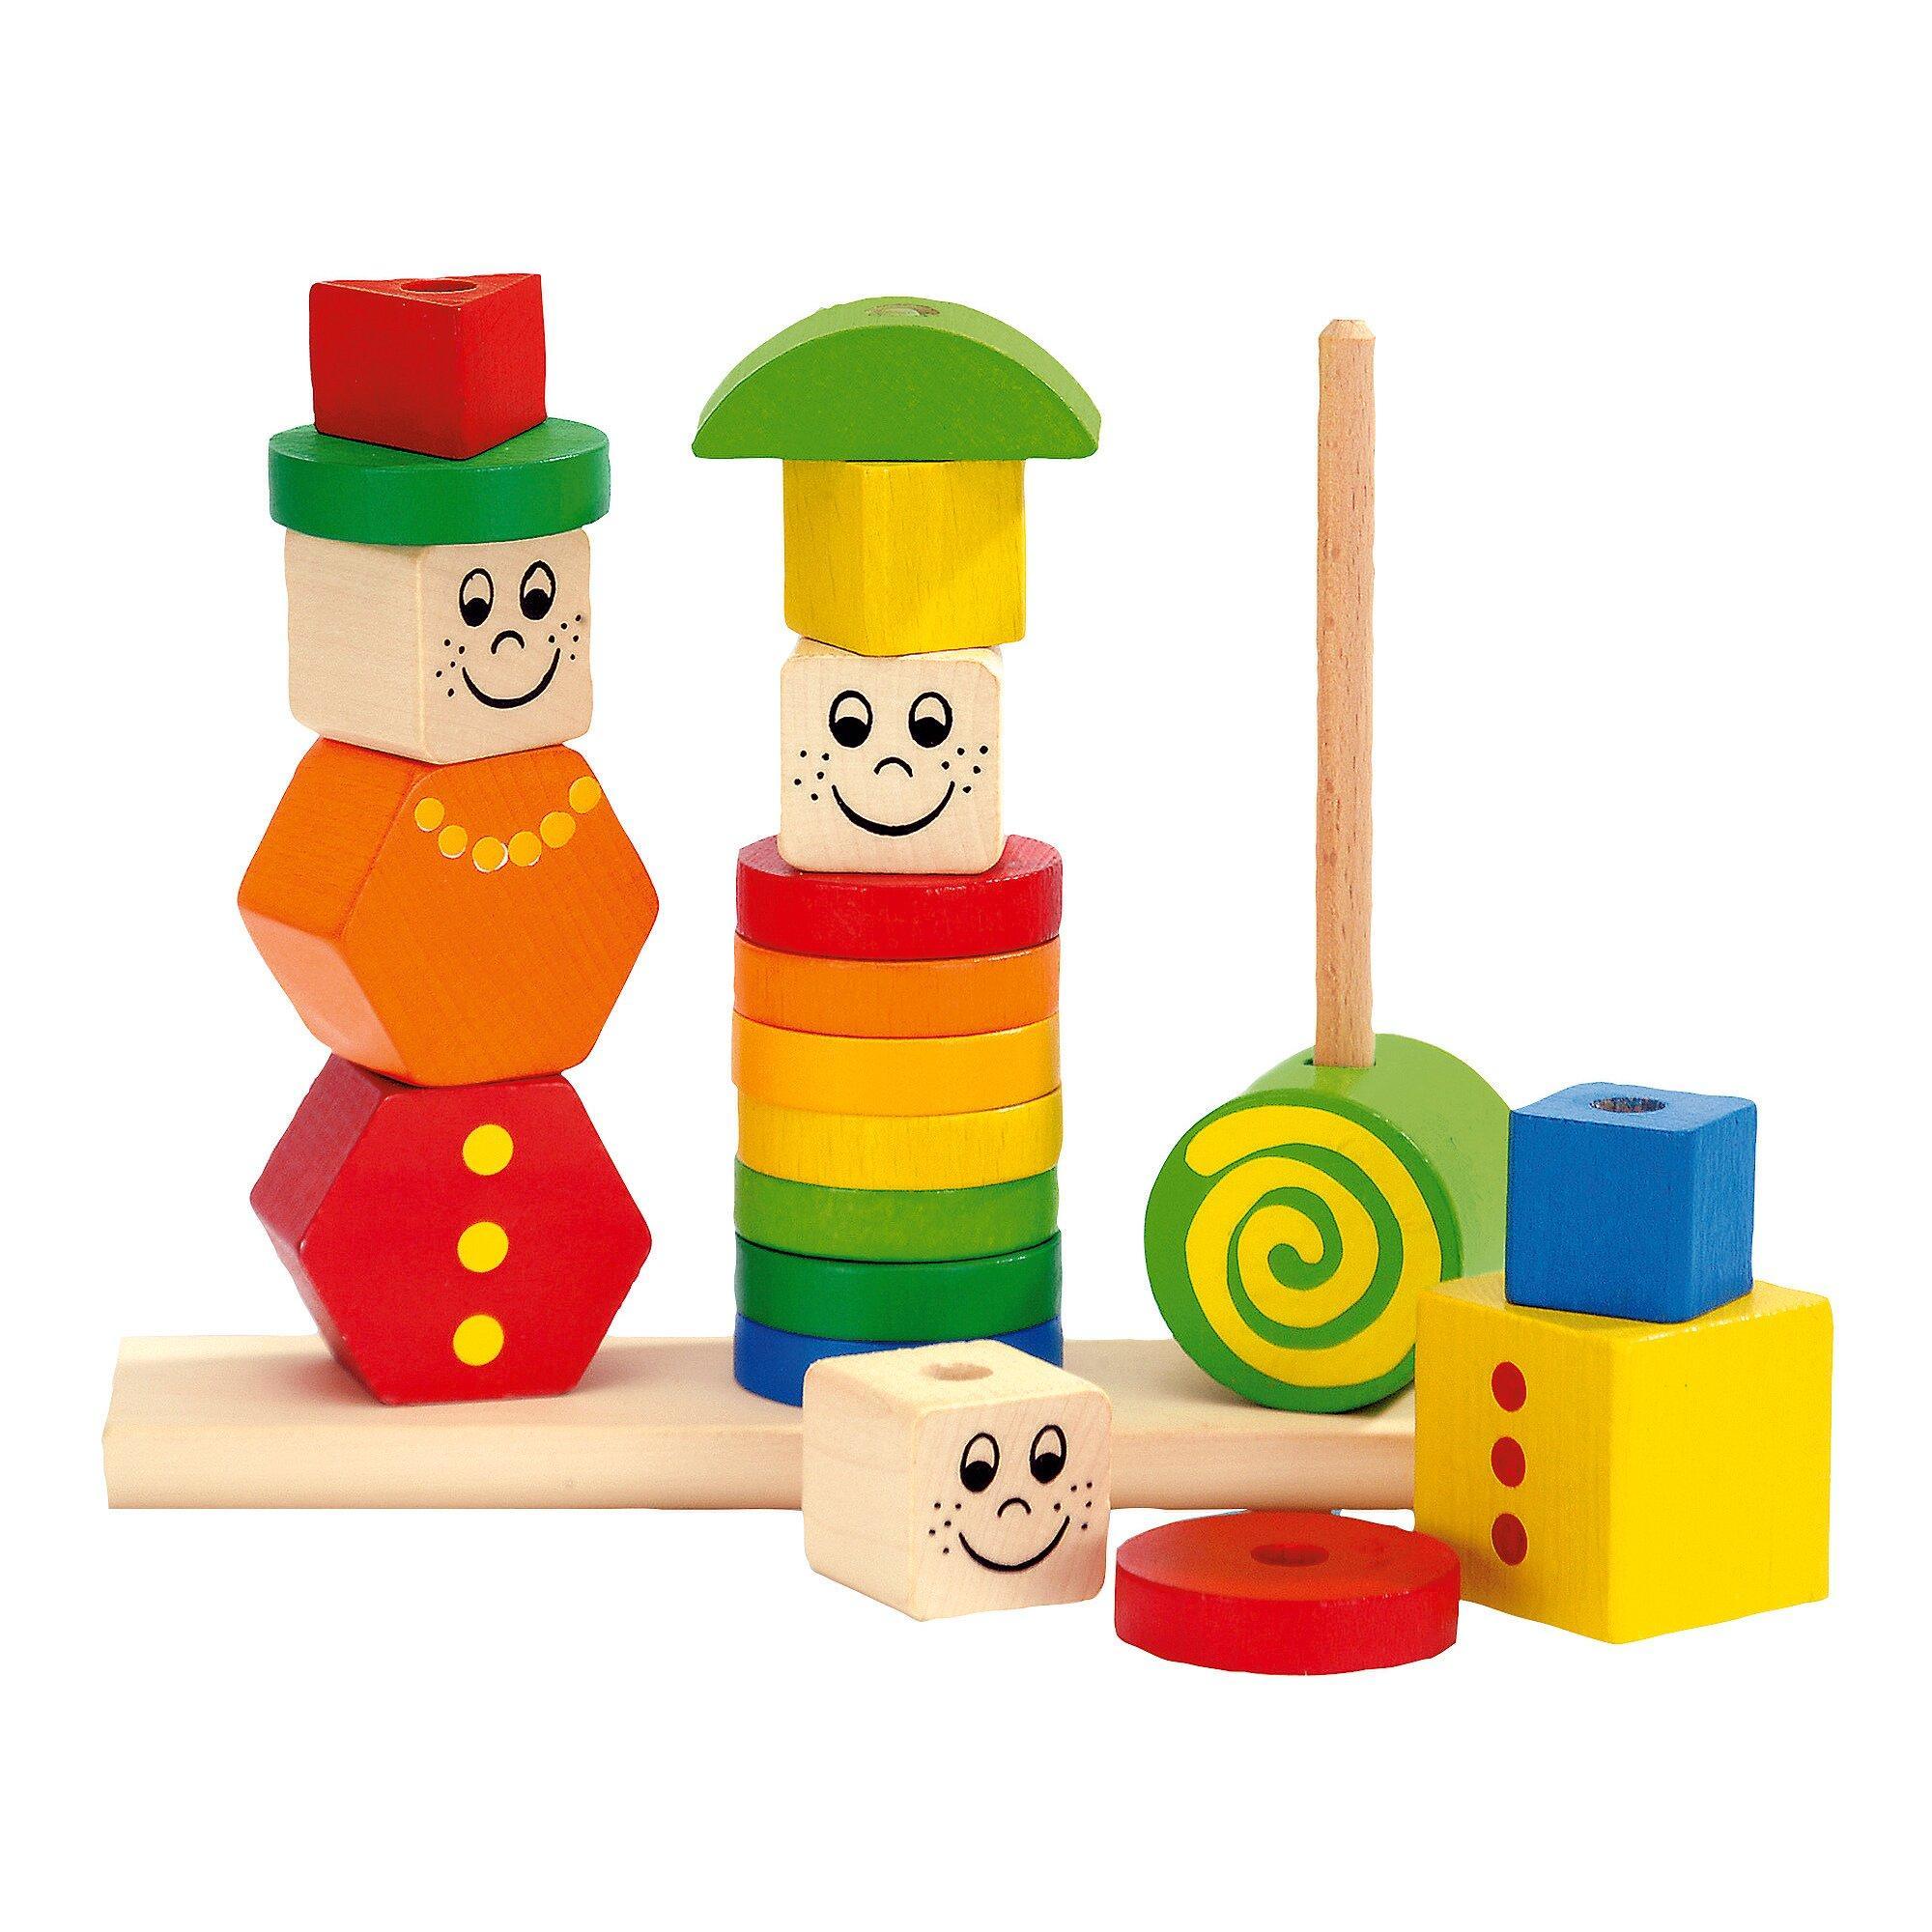 Steckpuzzle Figuren aus Holz